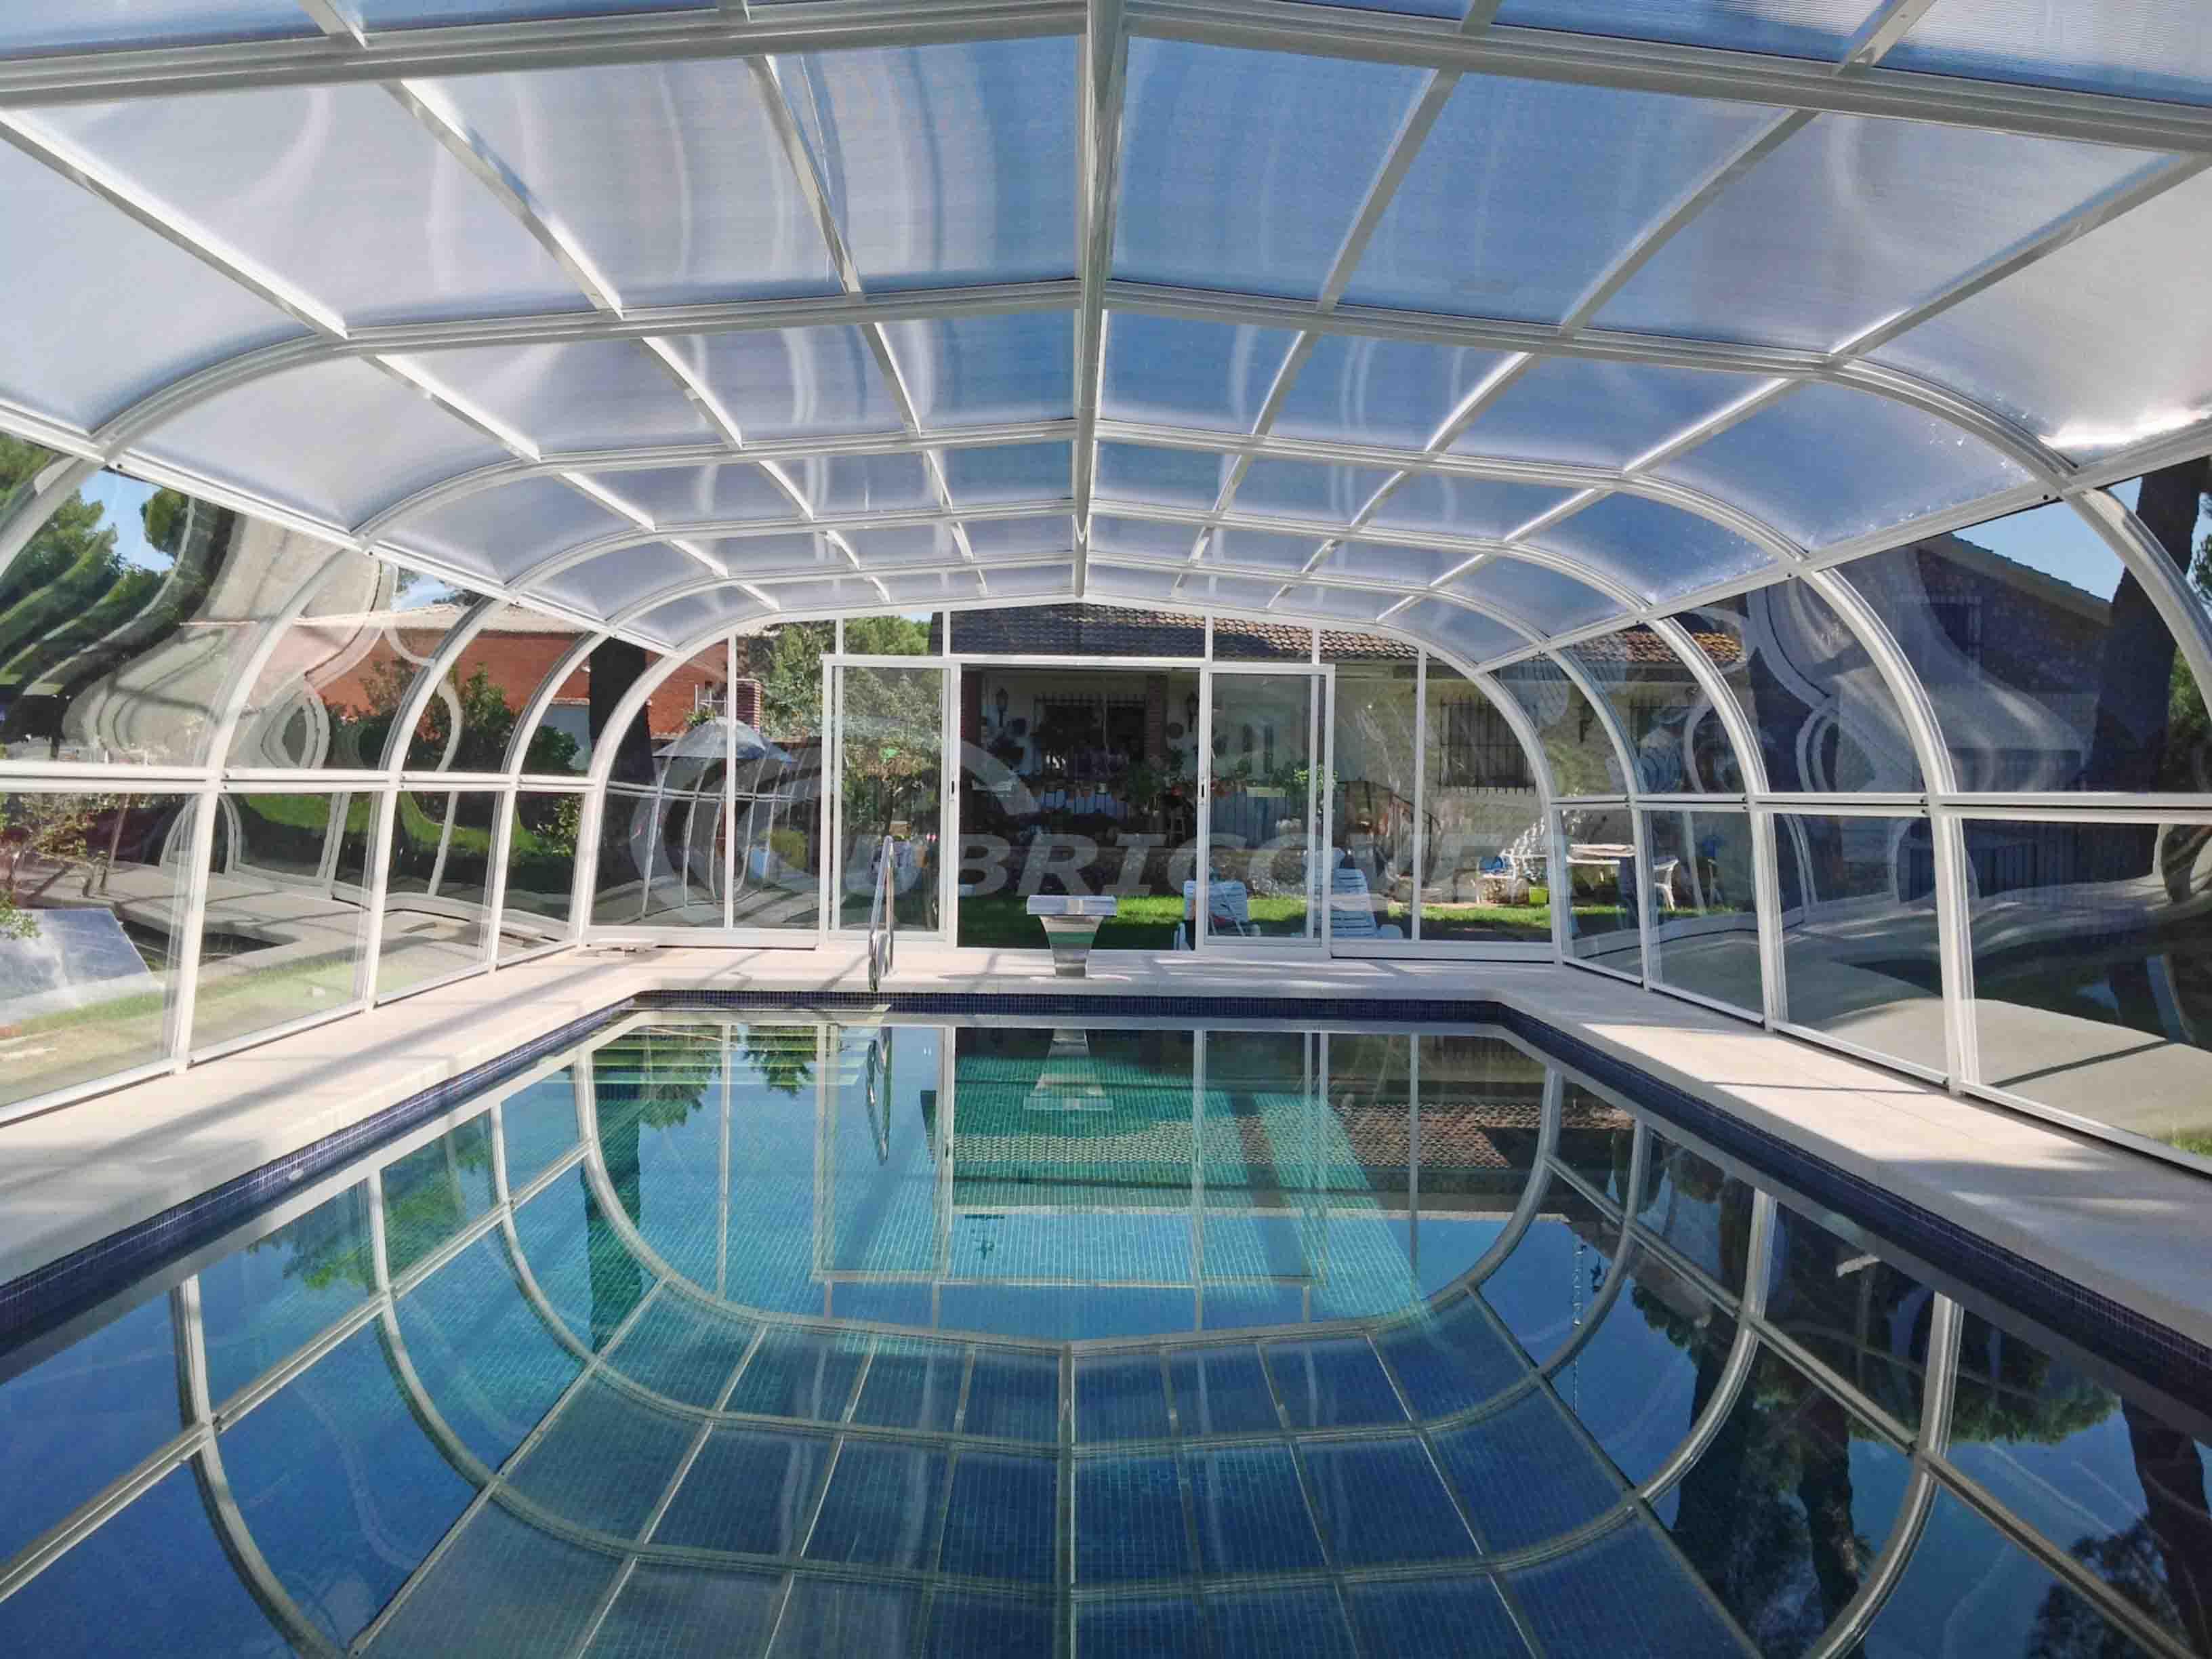 Piscina cubierta alcala de guadaira beautiful inauguracin de la piscina municipal with piscina - Piscina cubierta alicante ...